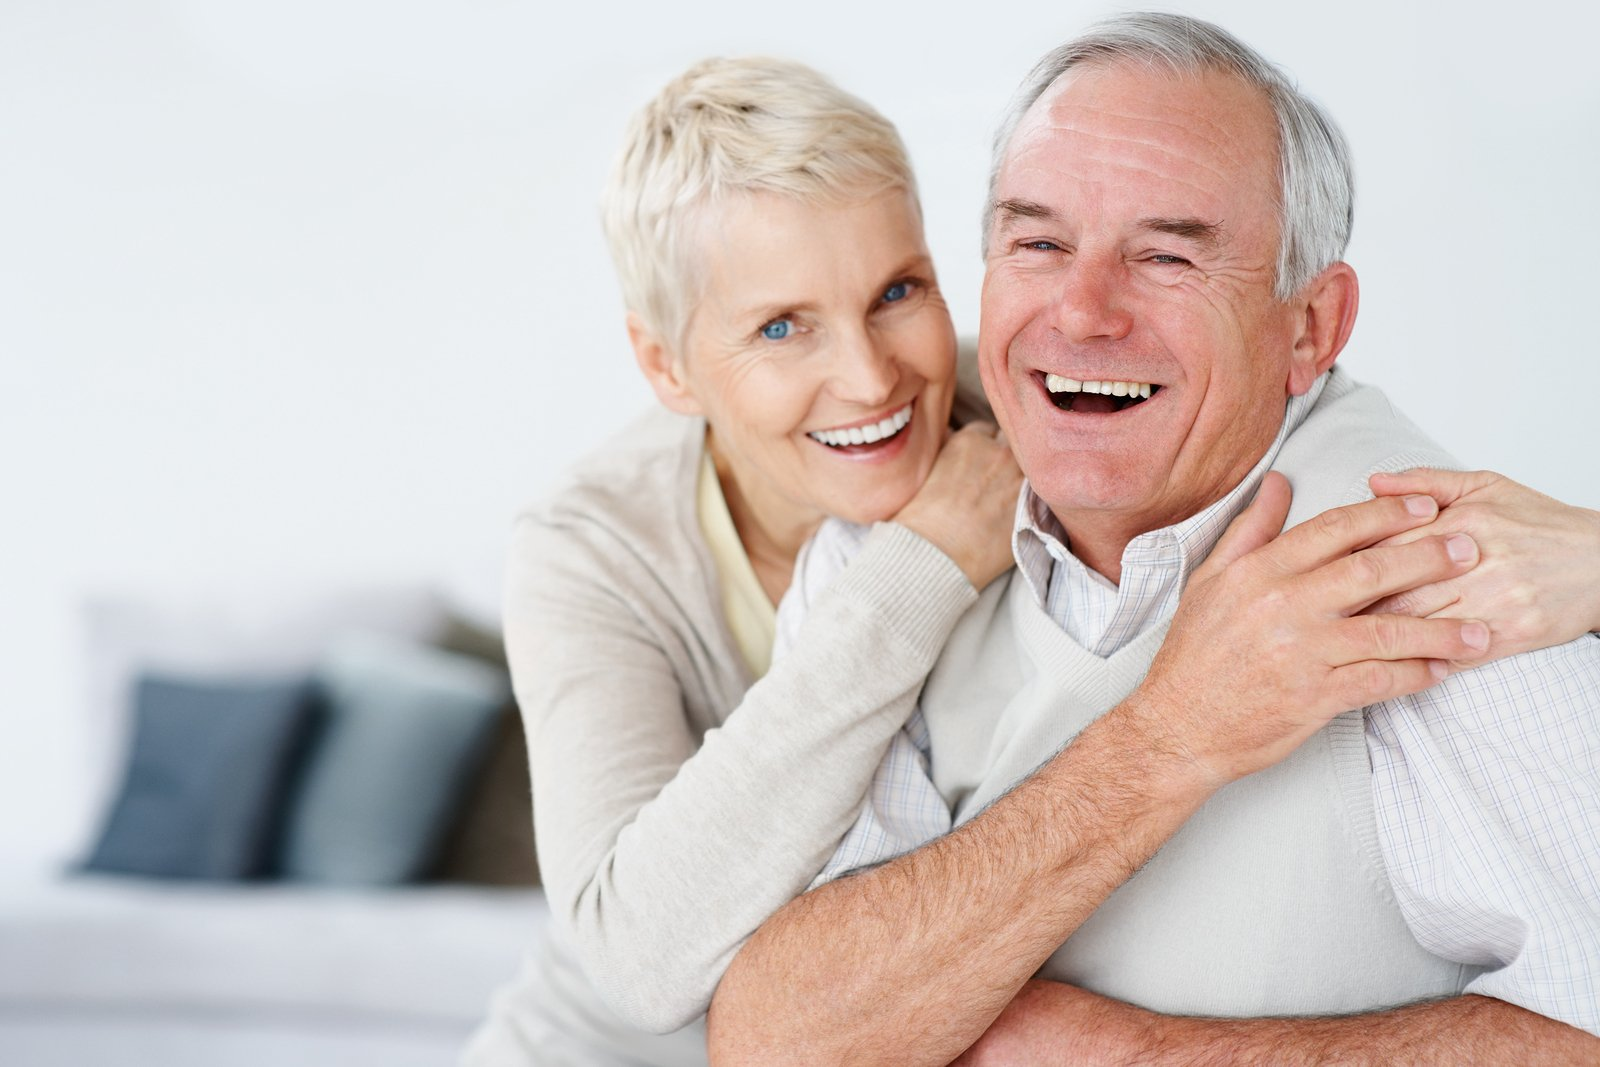 dating fase 5 relatieve dating test vragen